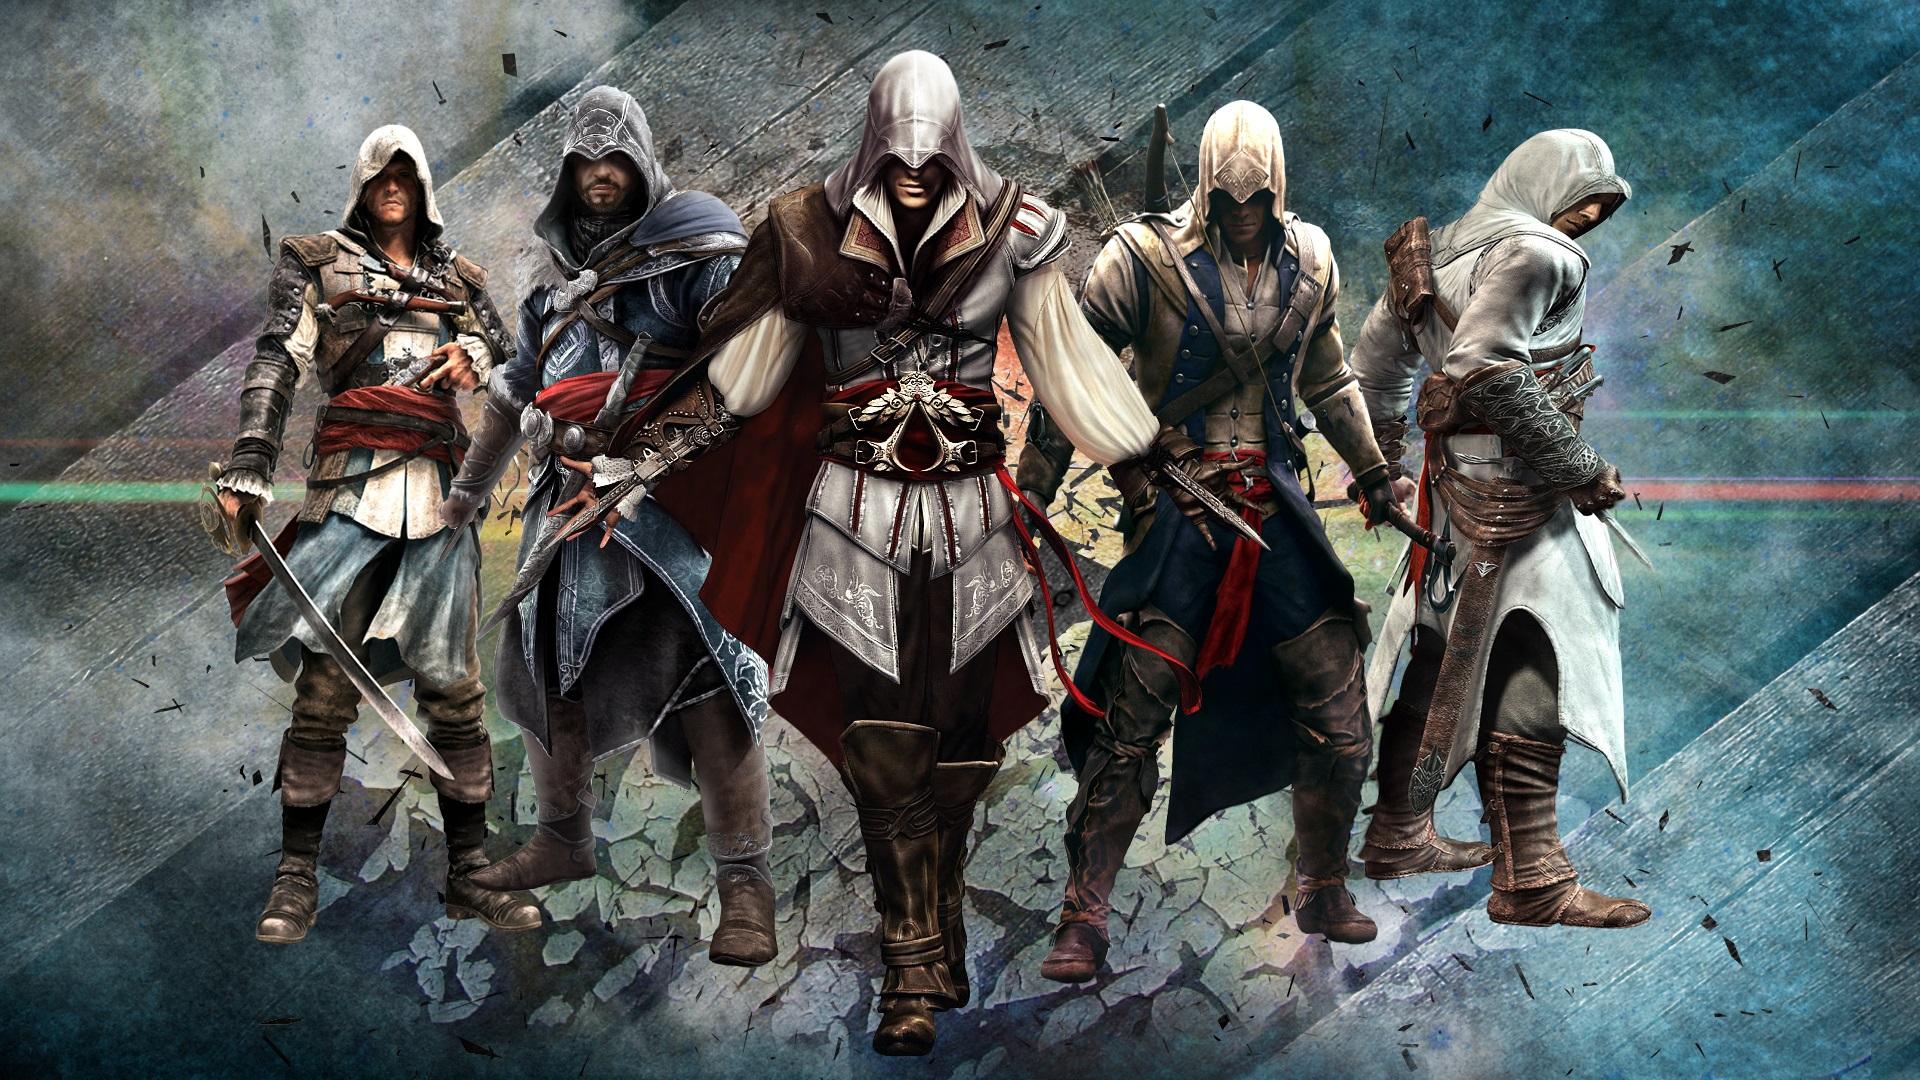 Free Download Assassins Creed Unity Wallpaper 6 Wallpapersbq